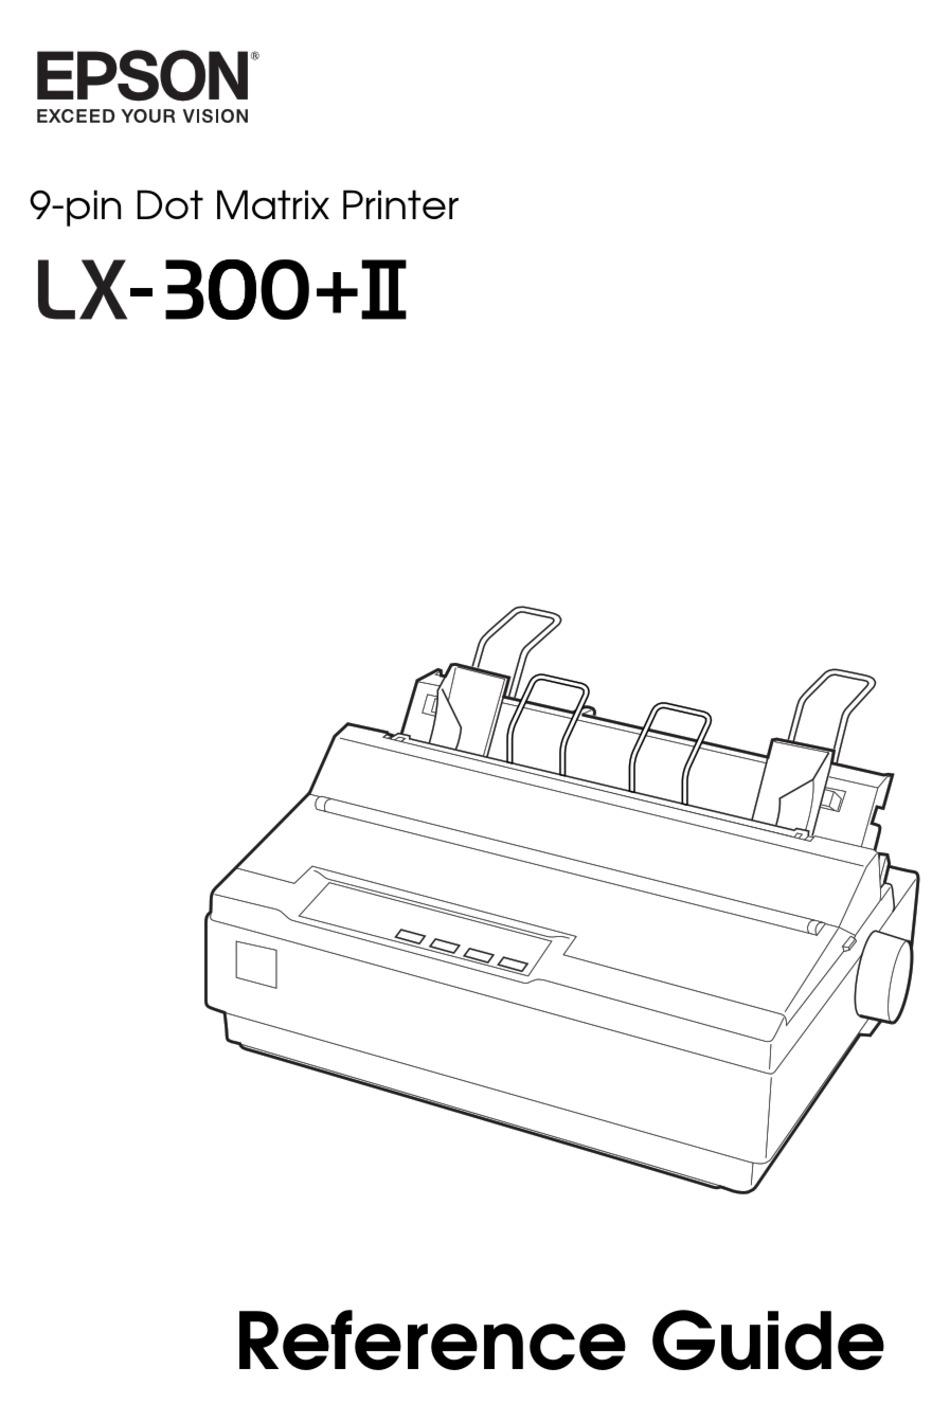 Epson Lx 300 Ii Reference Manual Pdf Download Manualslib